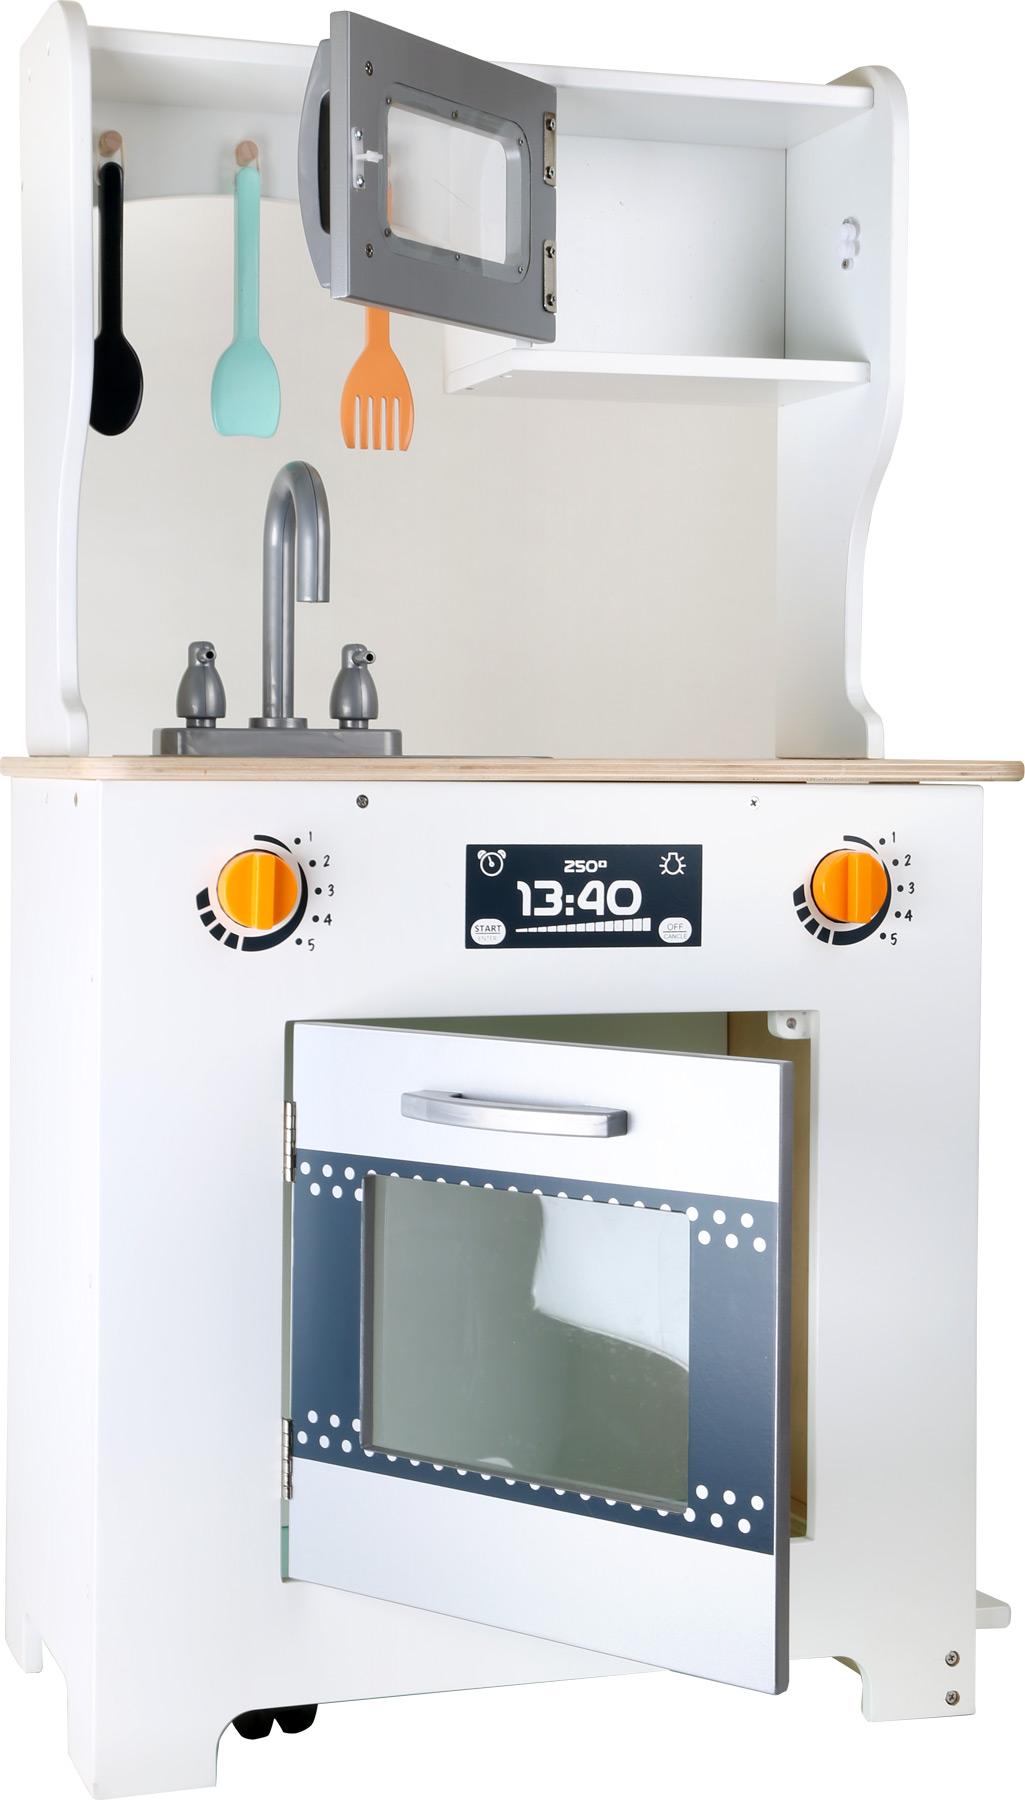 cuisine pour enfant avec comptoir moderne. Black Bedroom Furniture Sets. Home Design Ideas